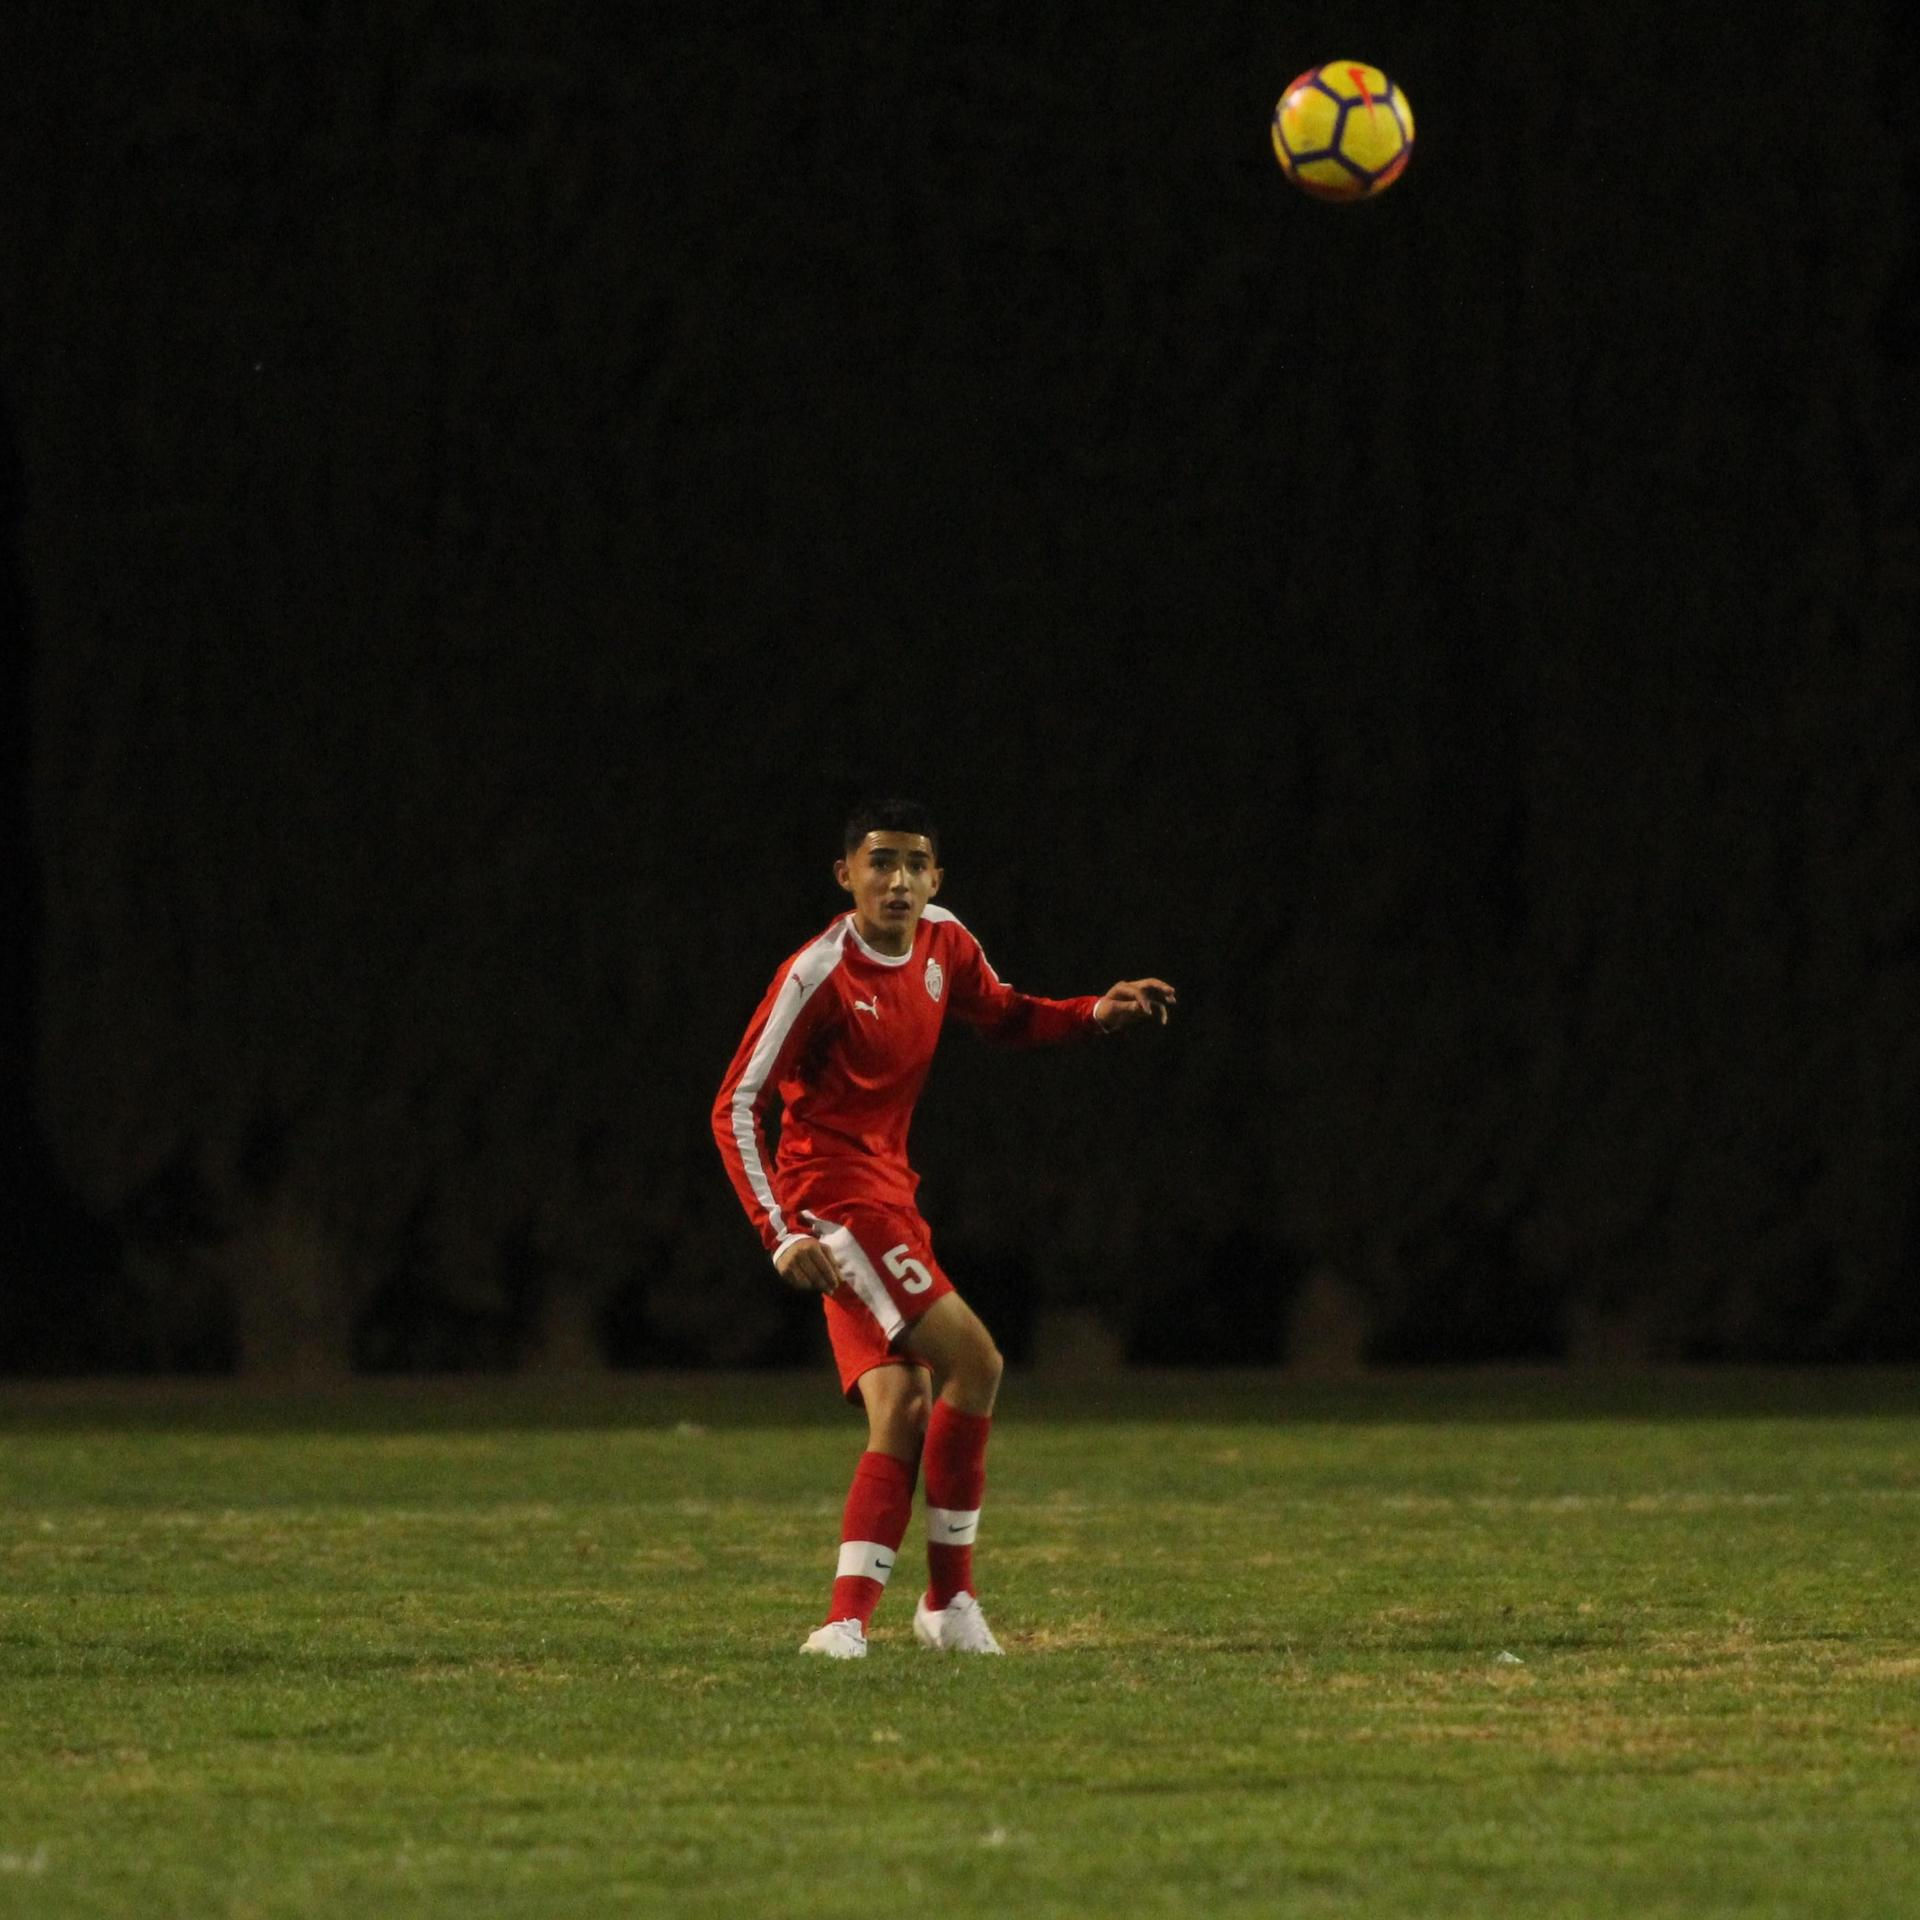 Edgar Campos kicking